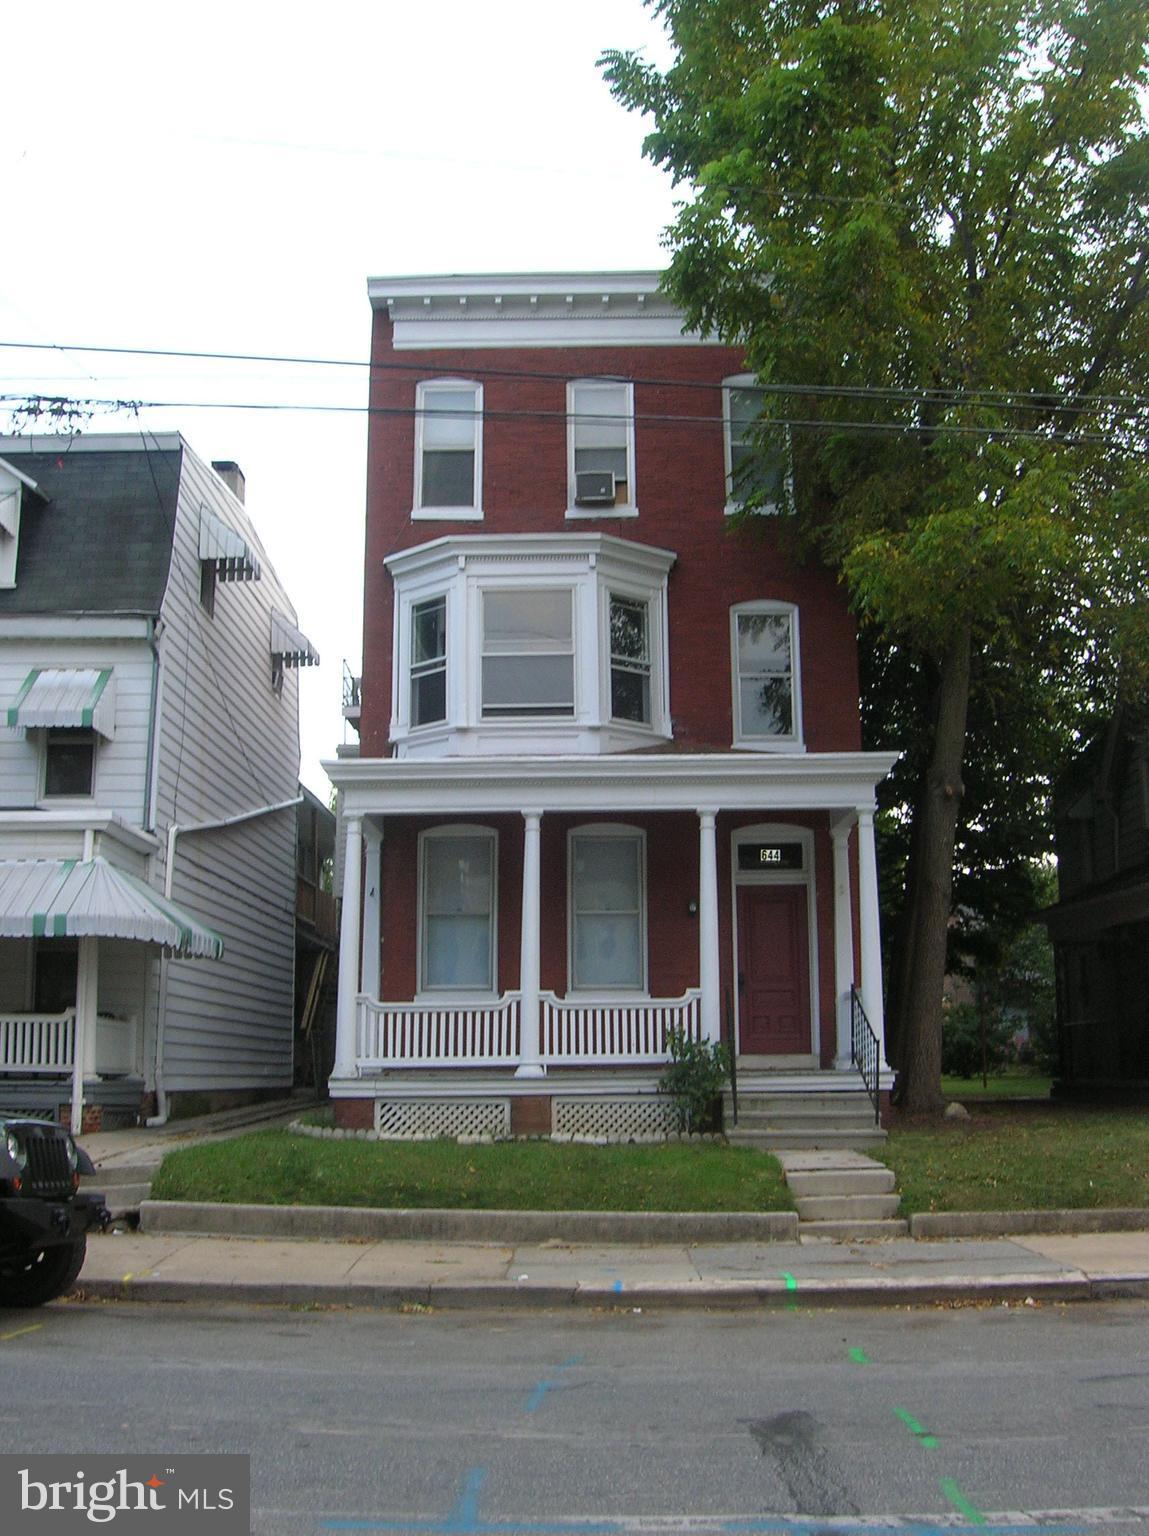 644 W PHILADELPHIA STREET, YORK, PA 17401